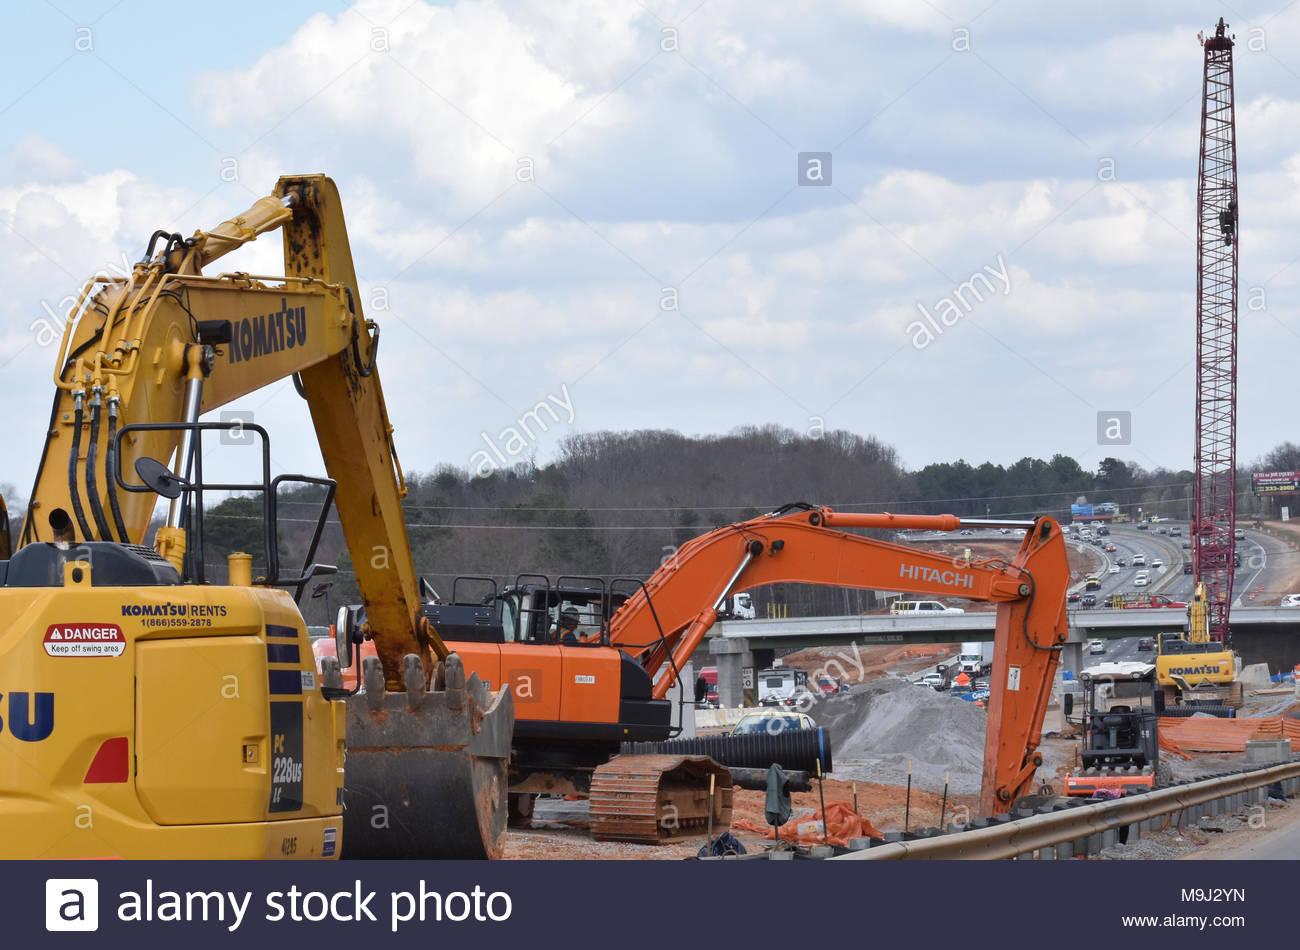 Construction congestion - Stock Image